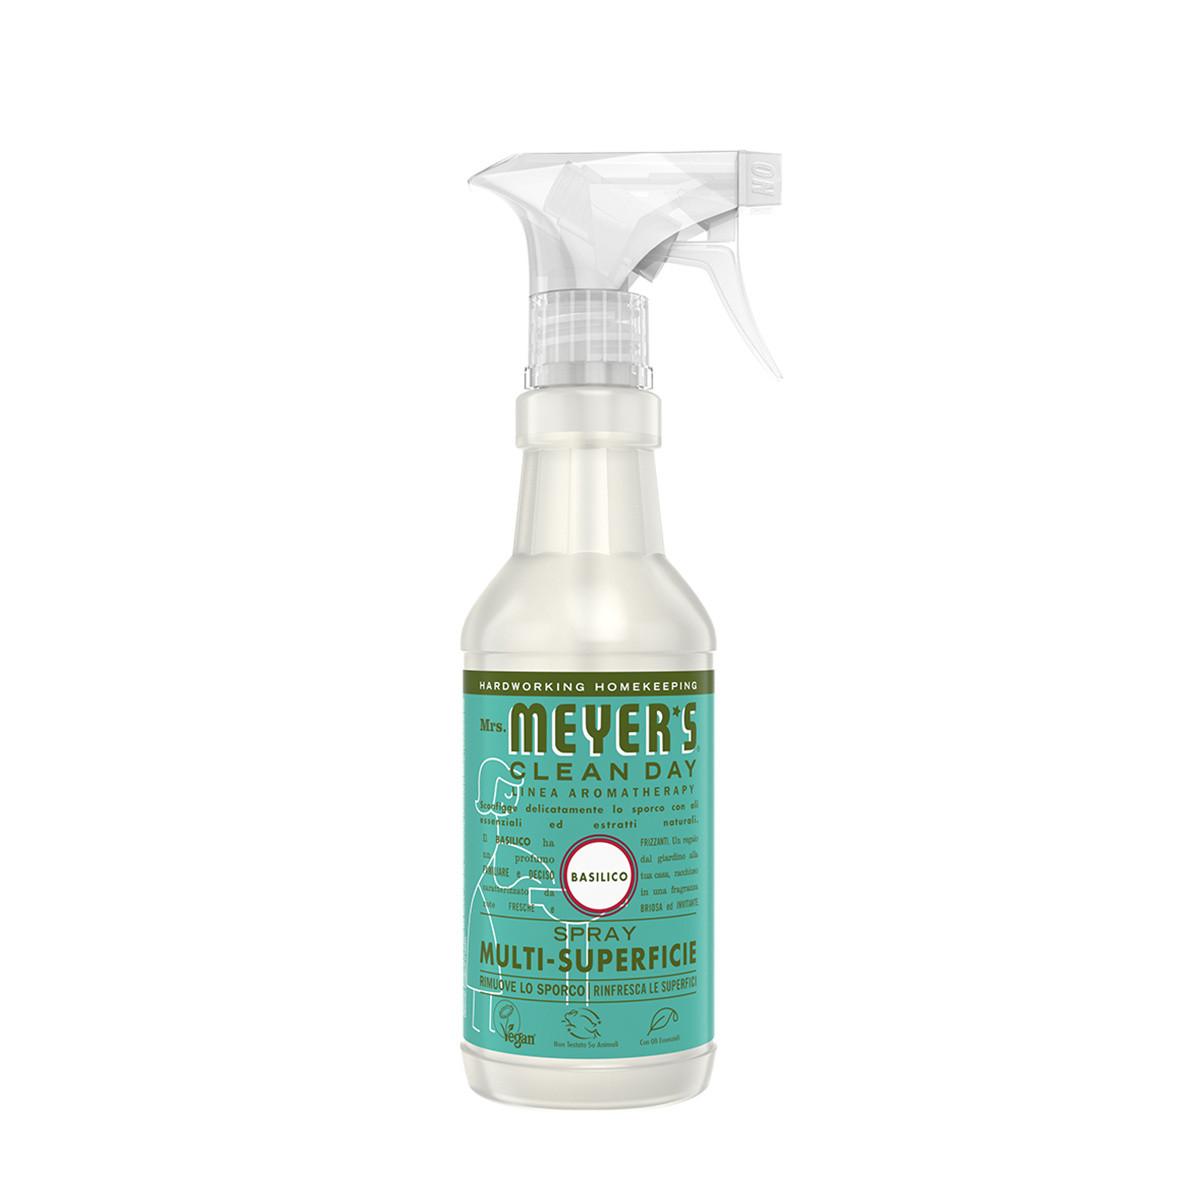 Spray detergente multi-superficie profumo di basilico 473ml, Verde smeraldo, large image number 0